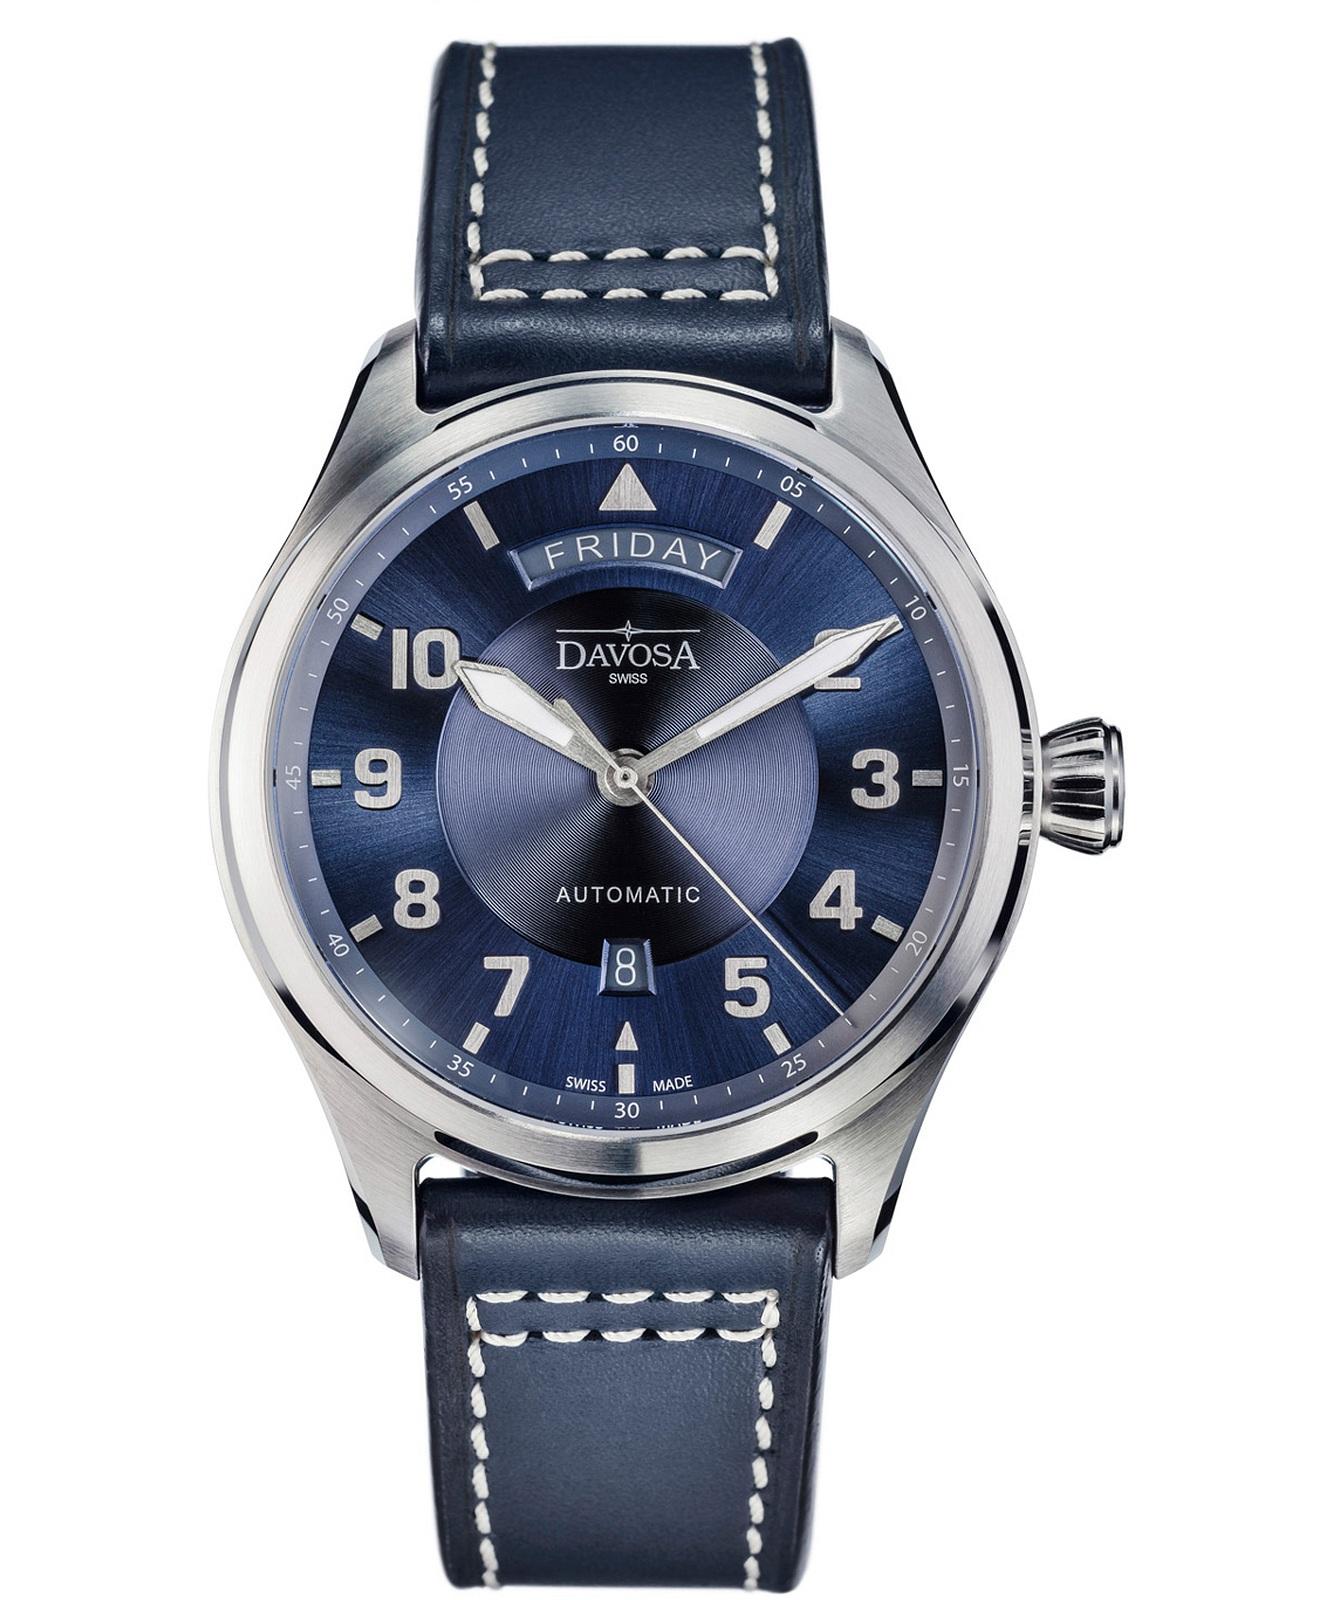 zegarek-meski-davosa-newton-pilot-day-date-automatic-161-585-45)